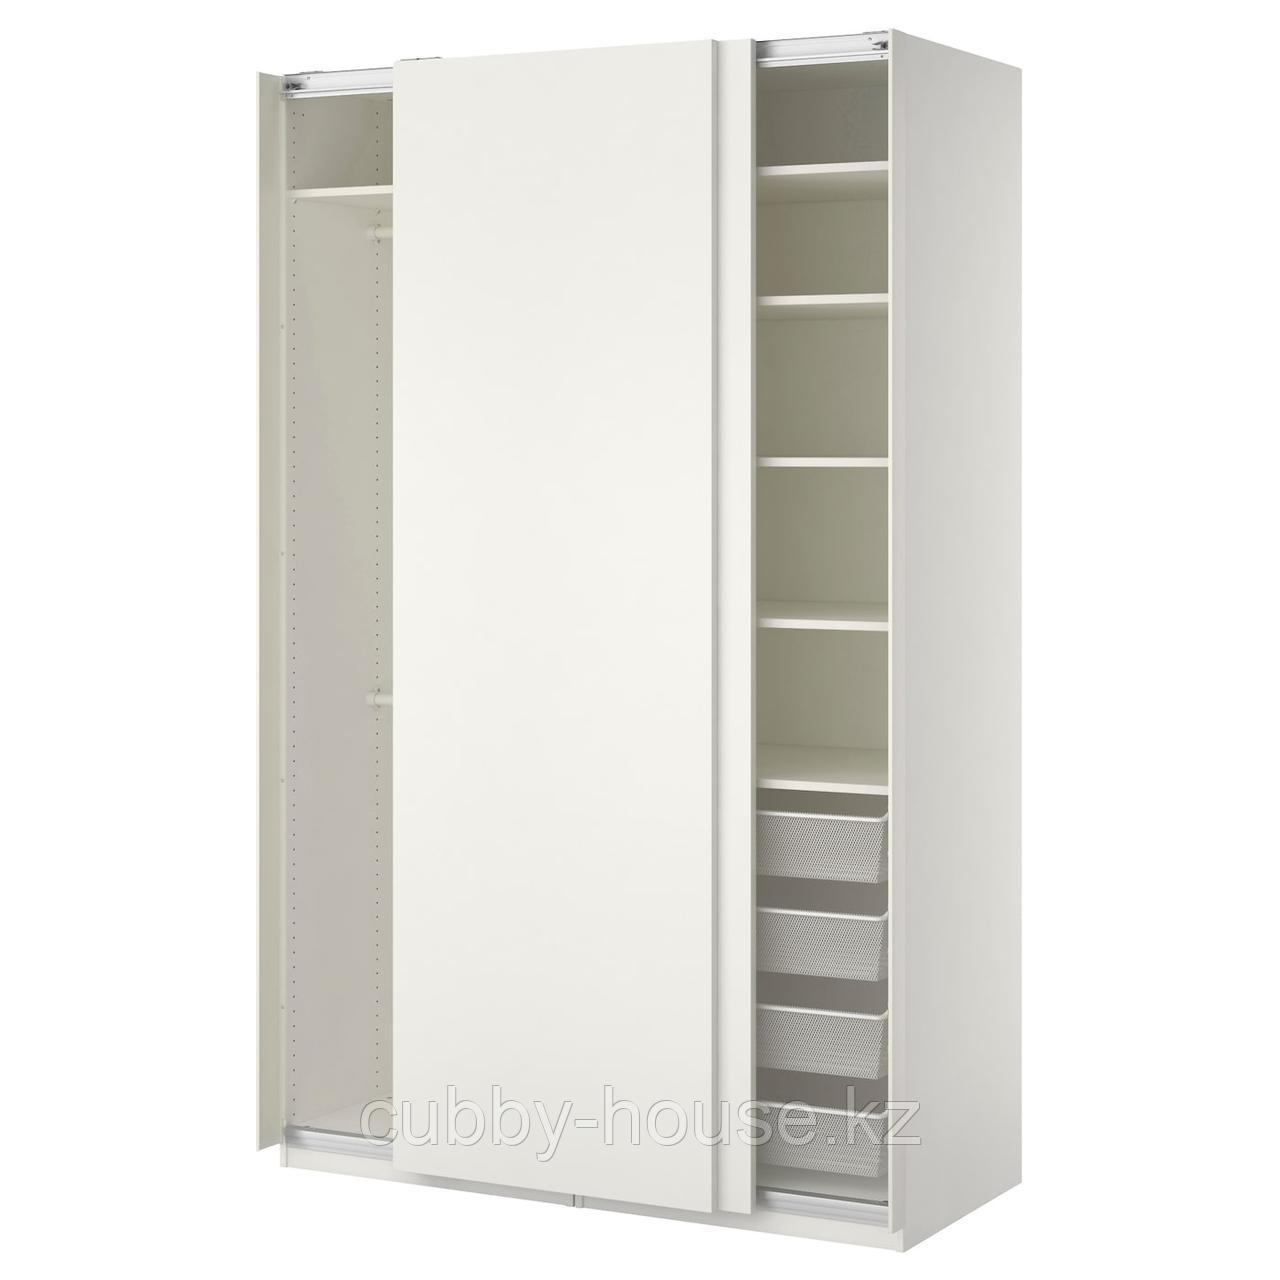 ПАКС Гардероб, белый, Хасвик белый, 150x66x236 см